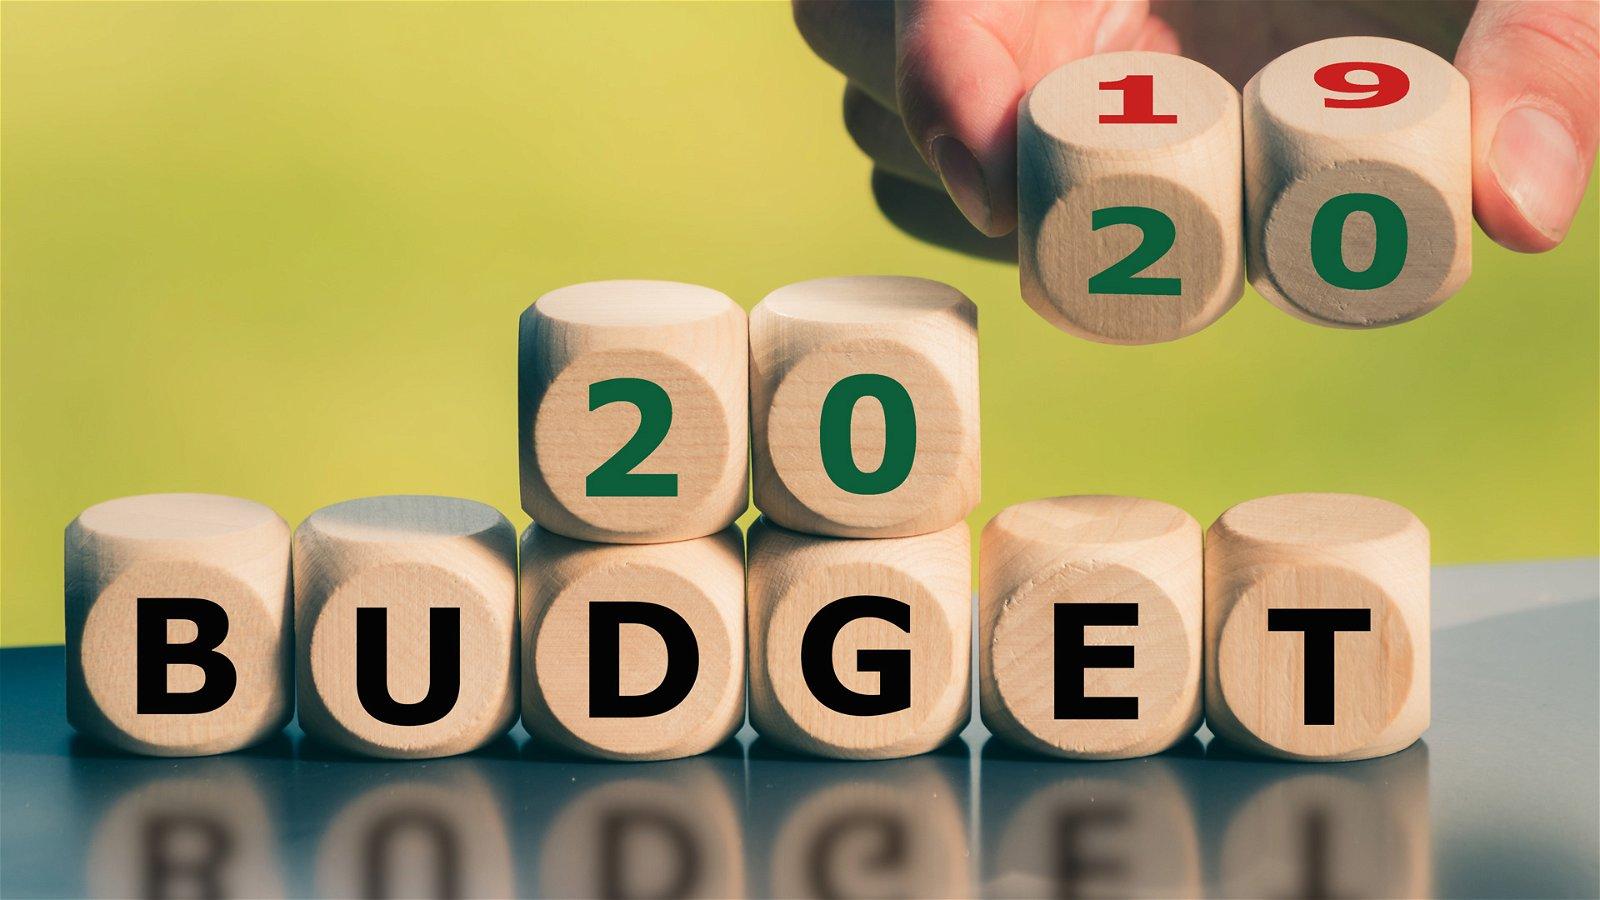 Budget 2020 - property management software